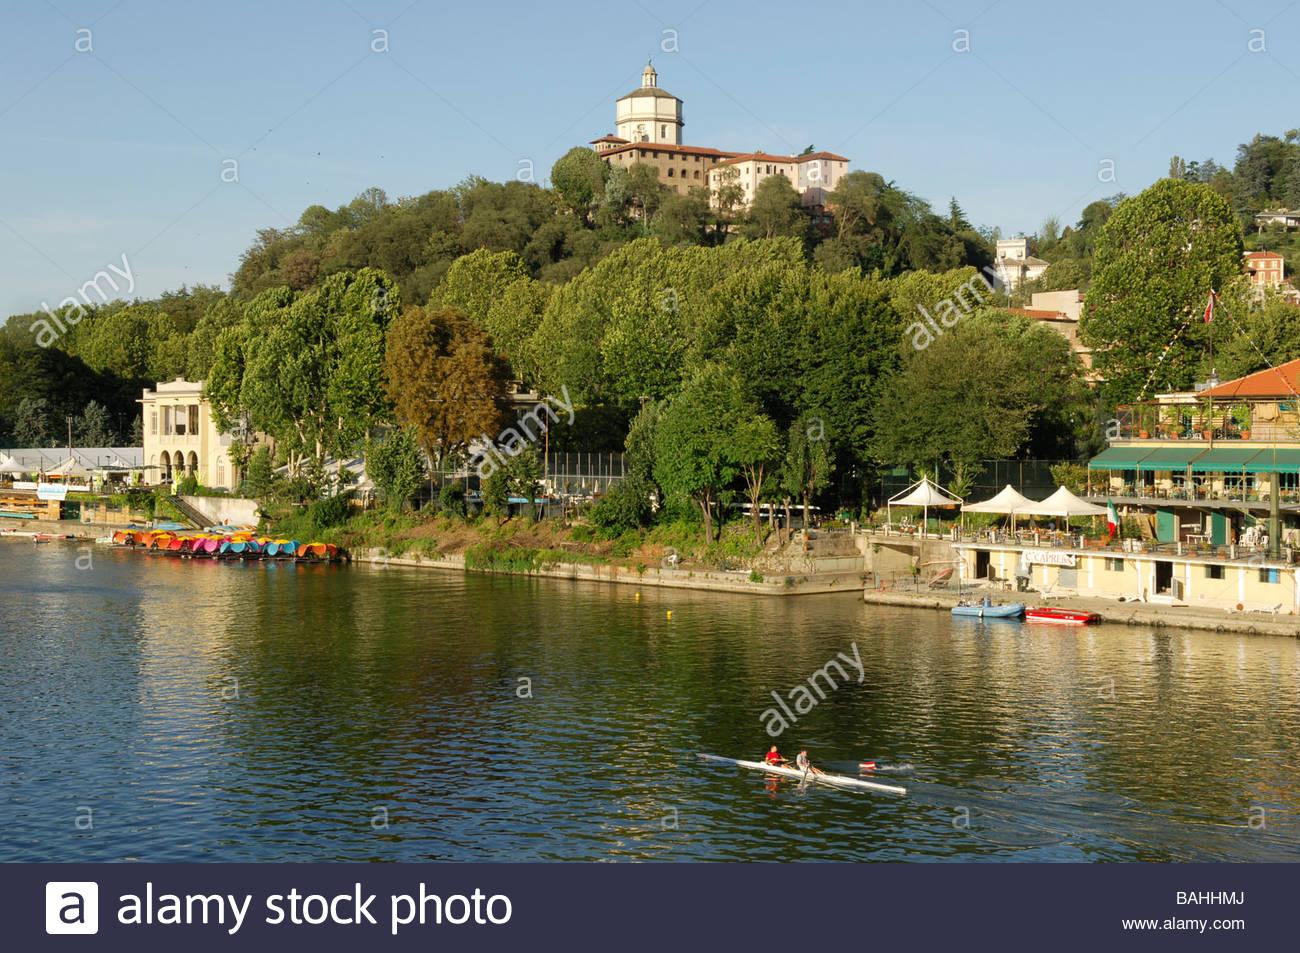 Po River Torino Piedmont Italy Stock Photo Royalty Free Image - Po river